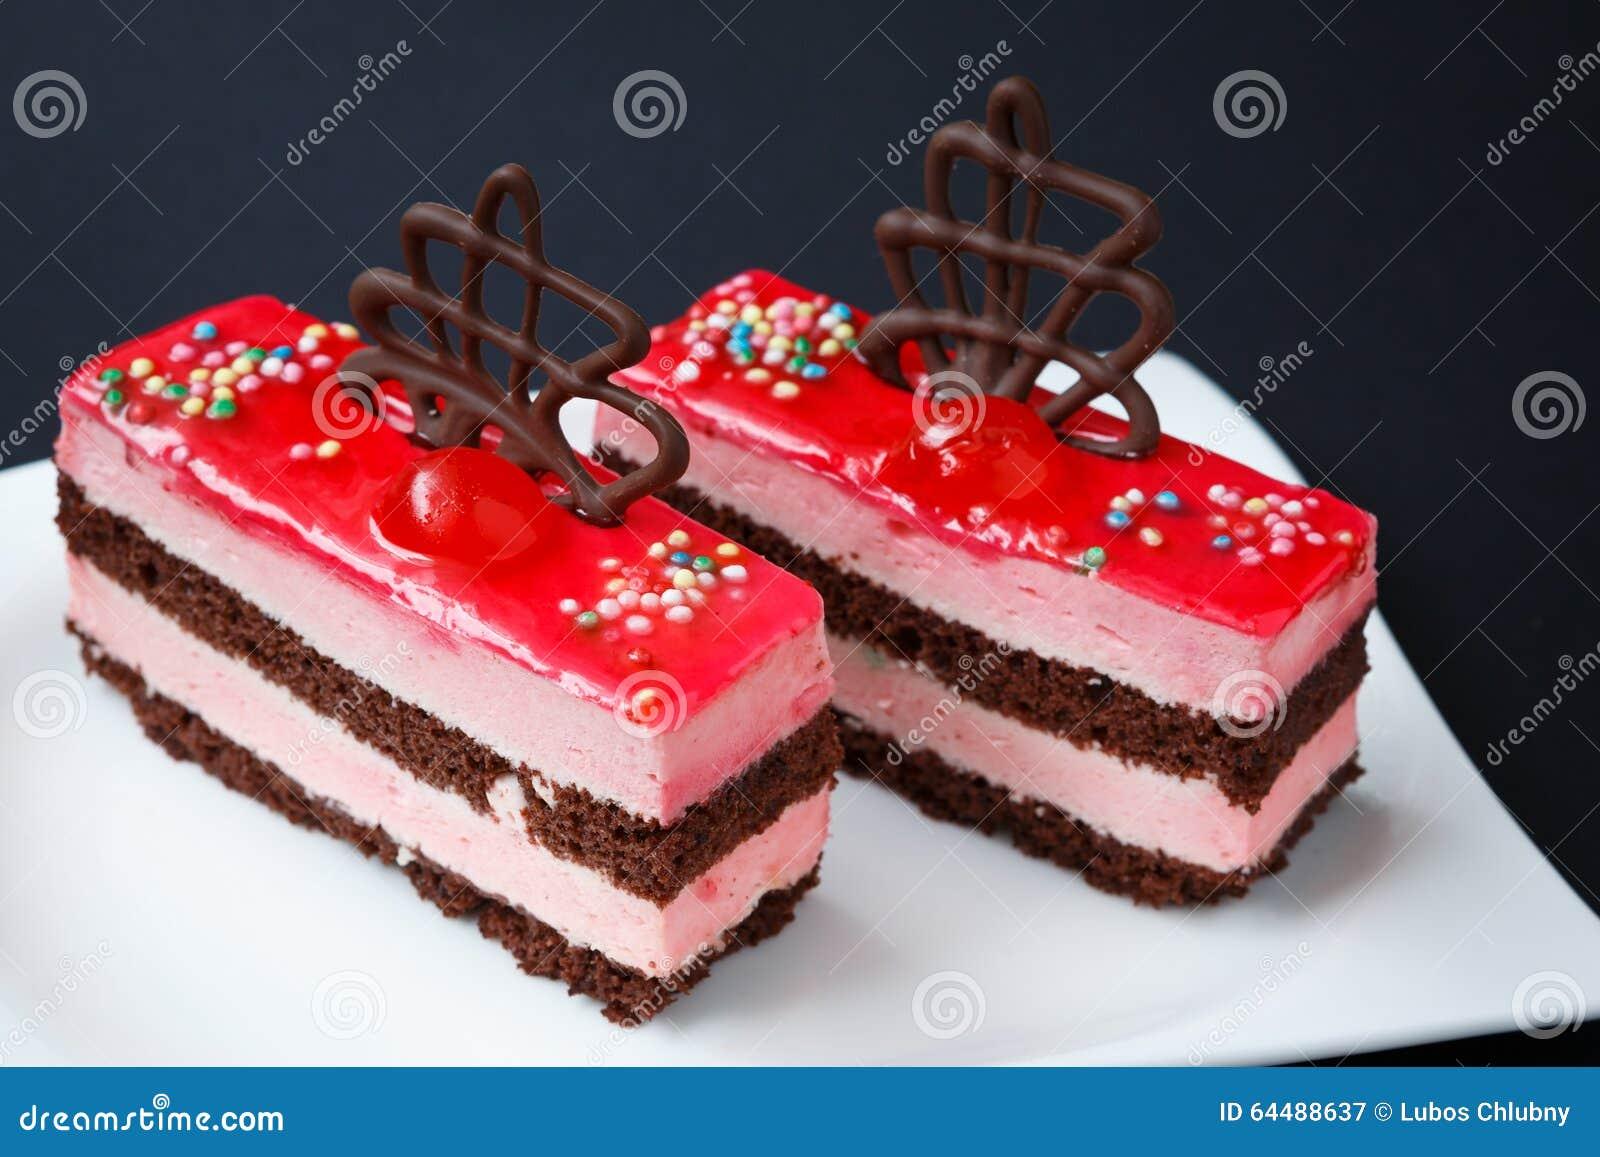 Sweet Desserts On A Black Background Stock Photo - Image: 64488637